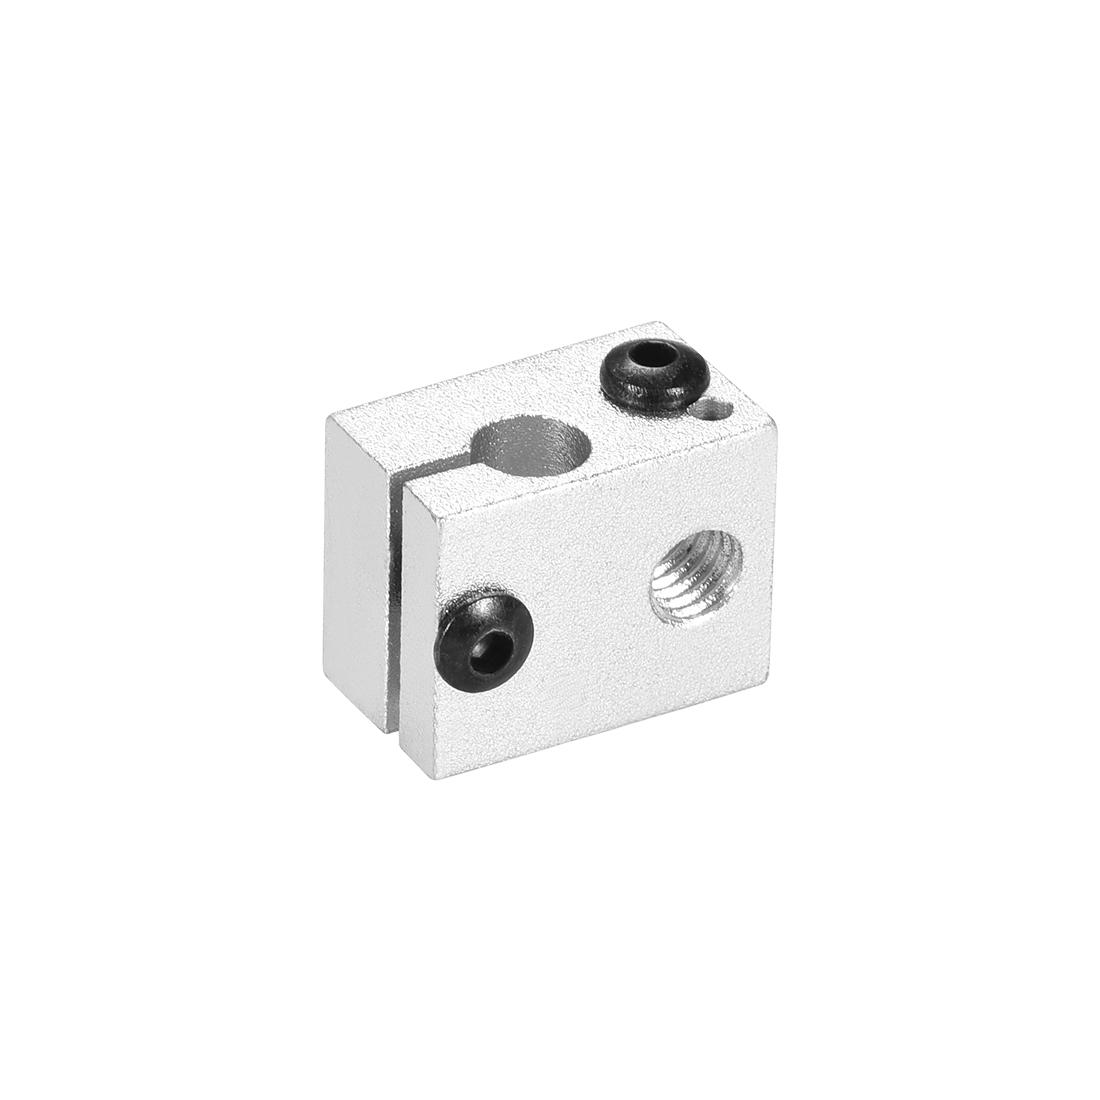 Aluminum Extruder Heater Block, Fit V6 3D Printer Silver